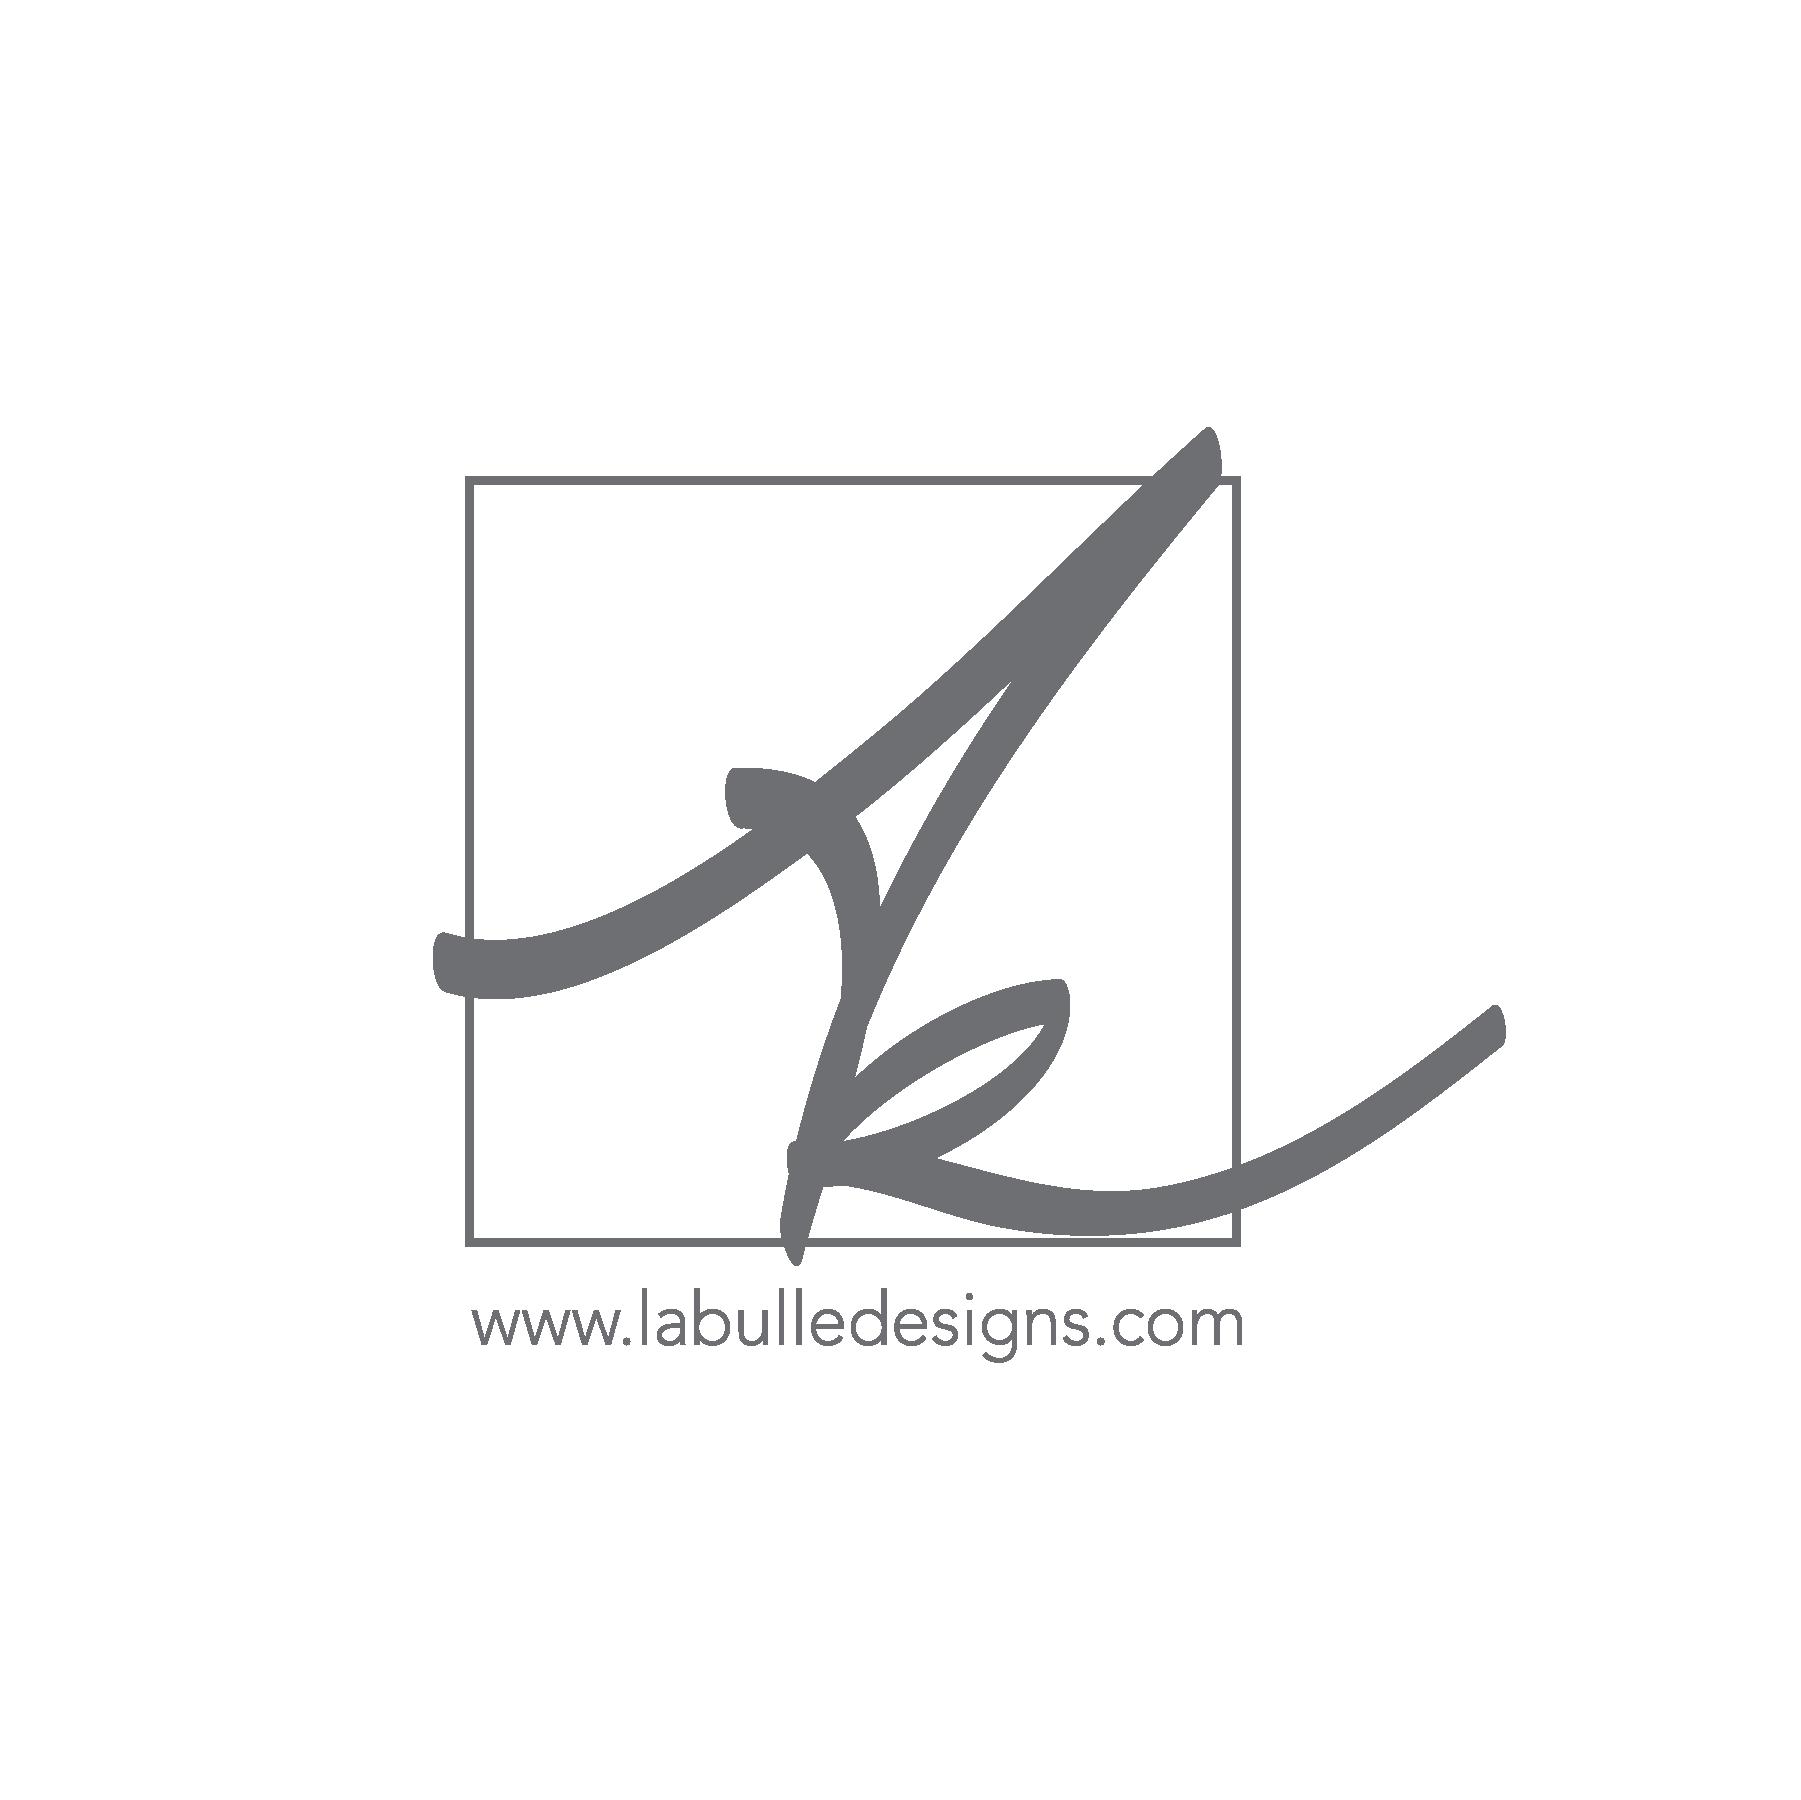 "Bulle:  noun  ( f):  In French, ""la bulle"" refers to a speech bubble or a soap bubble. La Bulle Designs combines creativity and business capabilities to give your company a strategic advantage!"